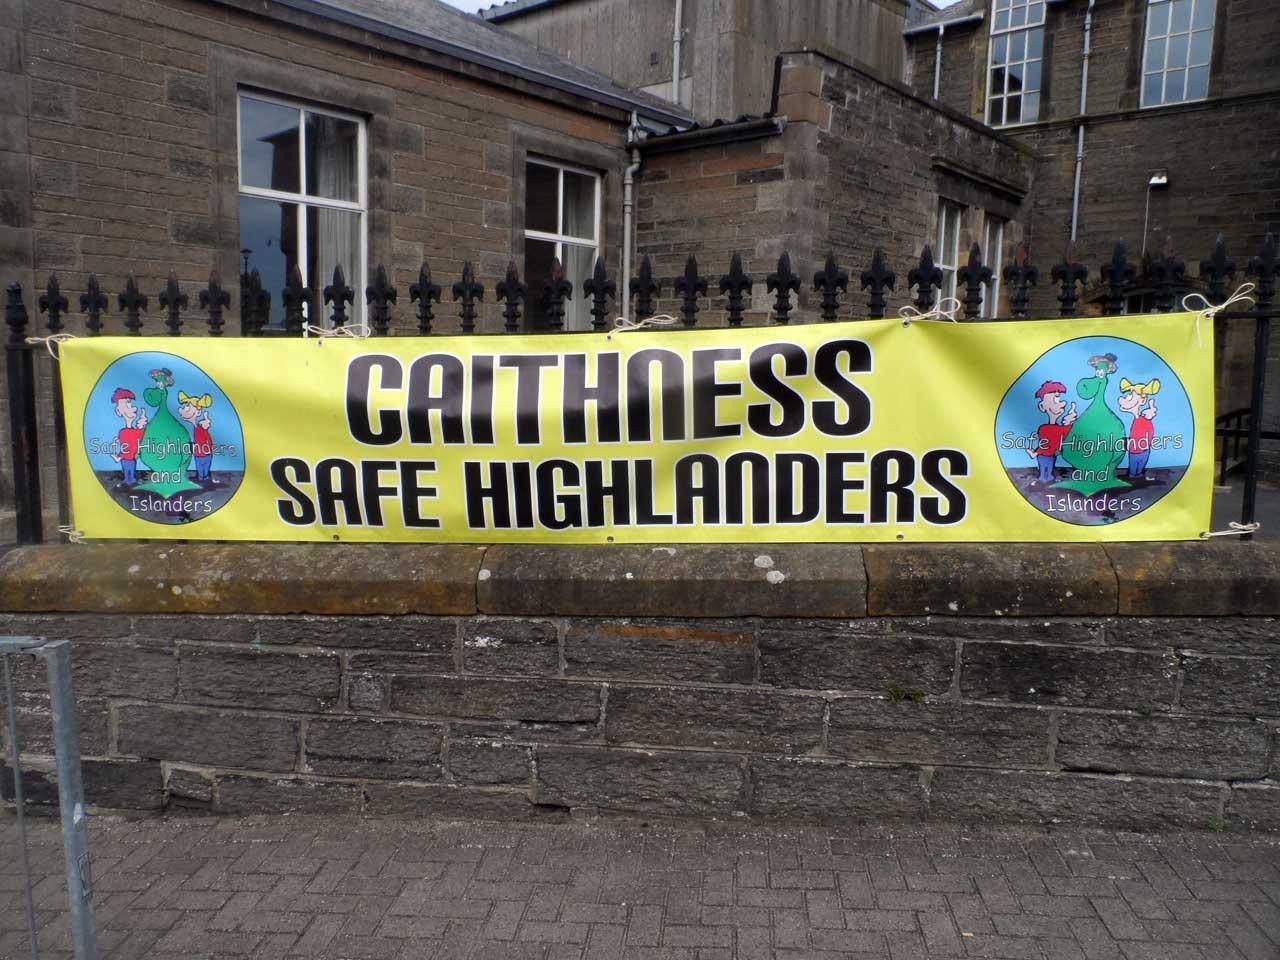 Photo: Caithness Safe Highlanders